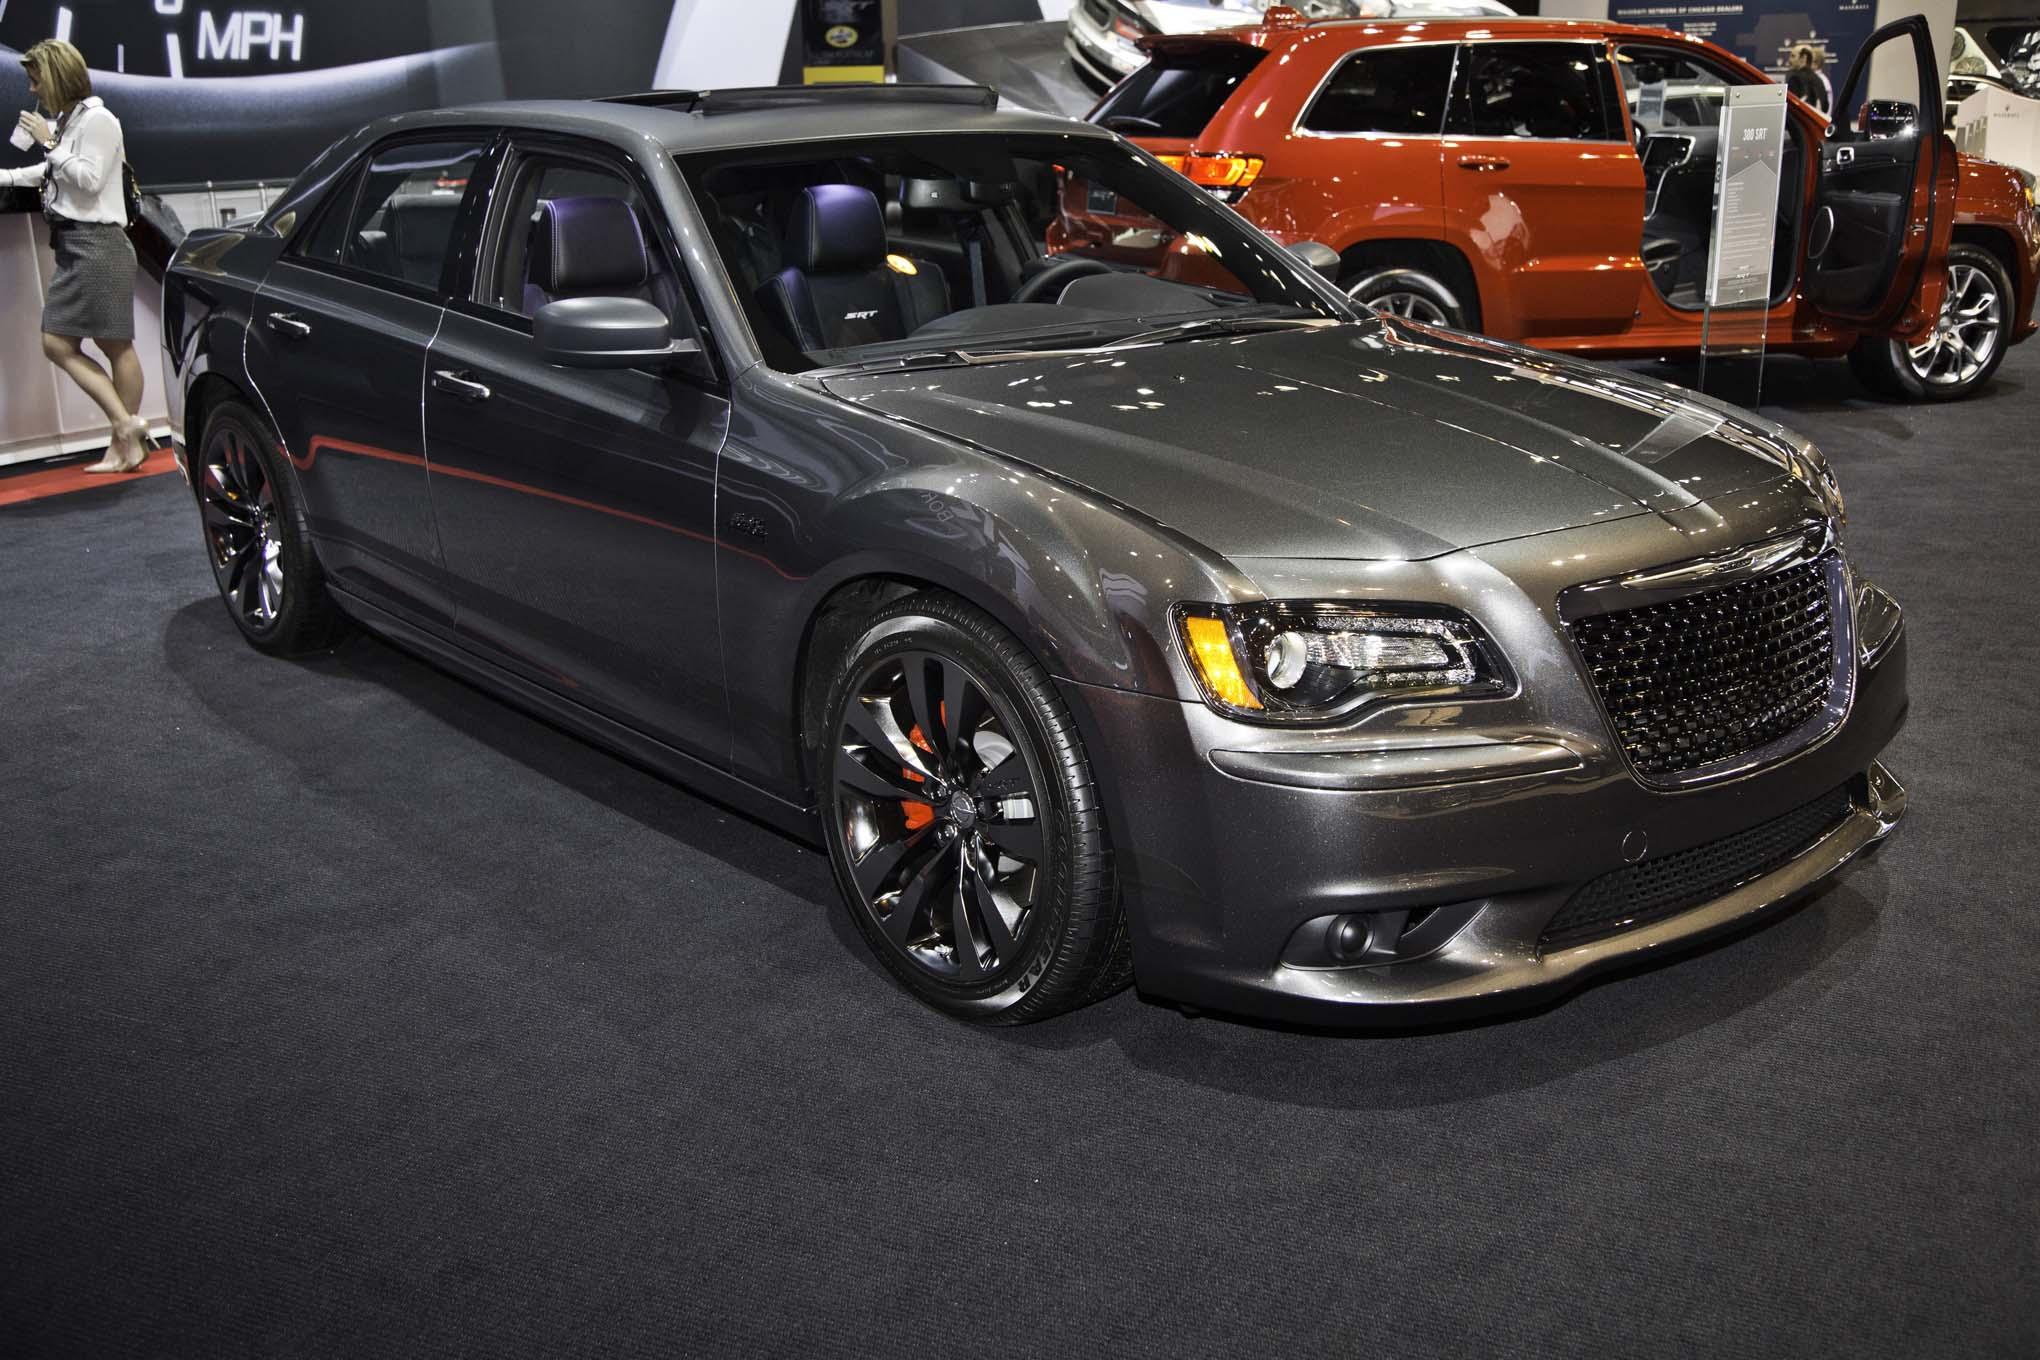 2014 Chrysler 300 SRT Satin Vapor Edition Front Three Quarter1